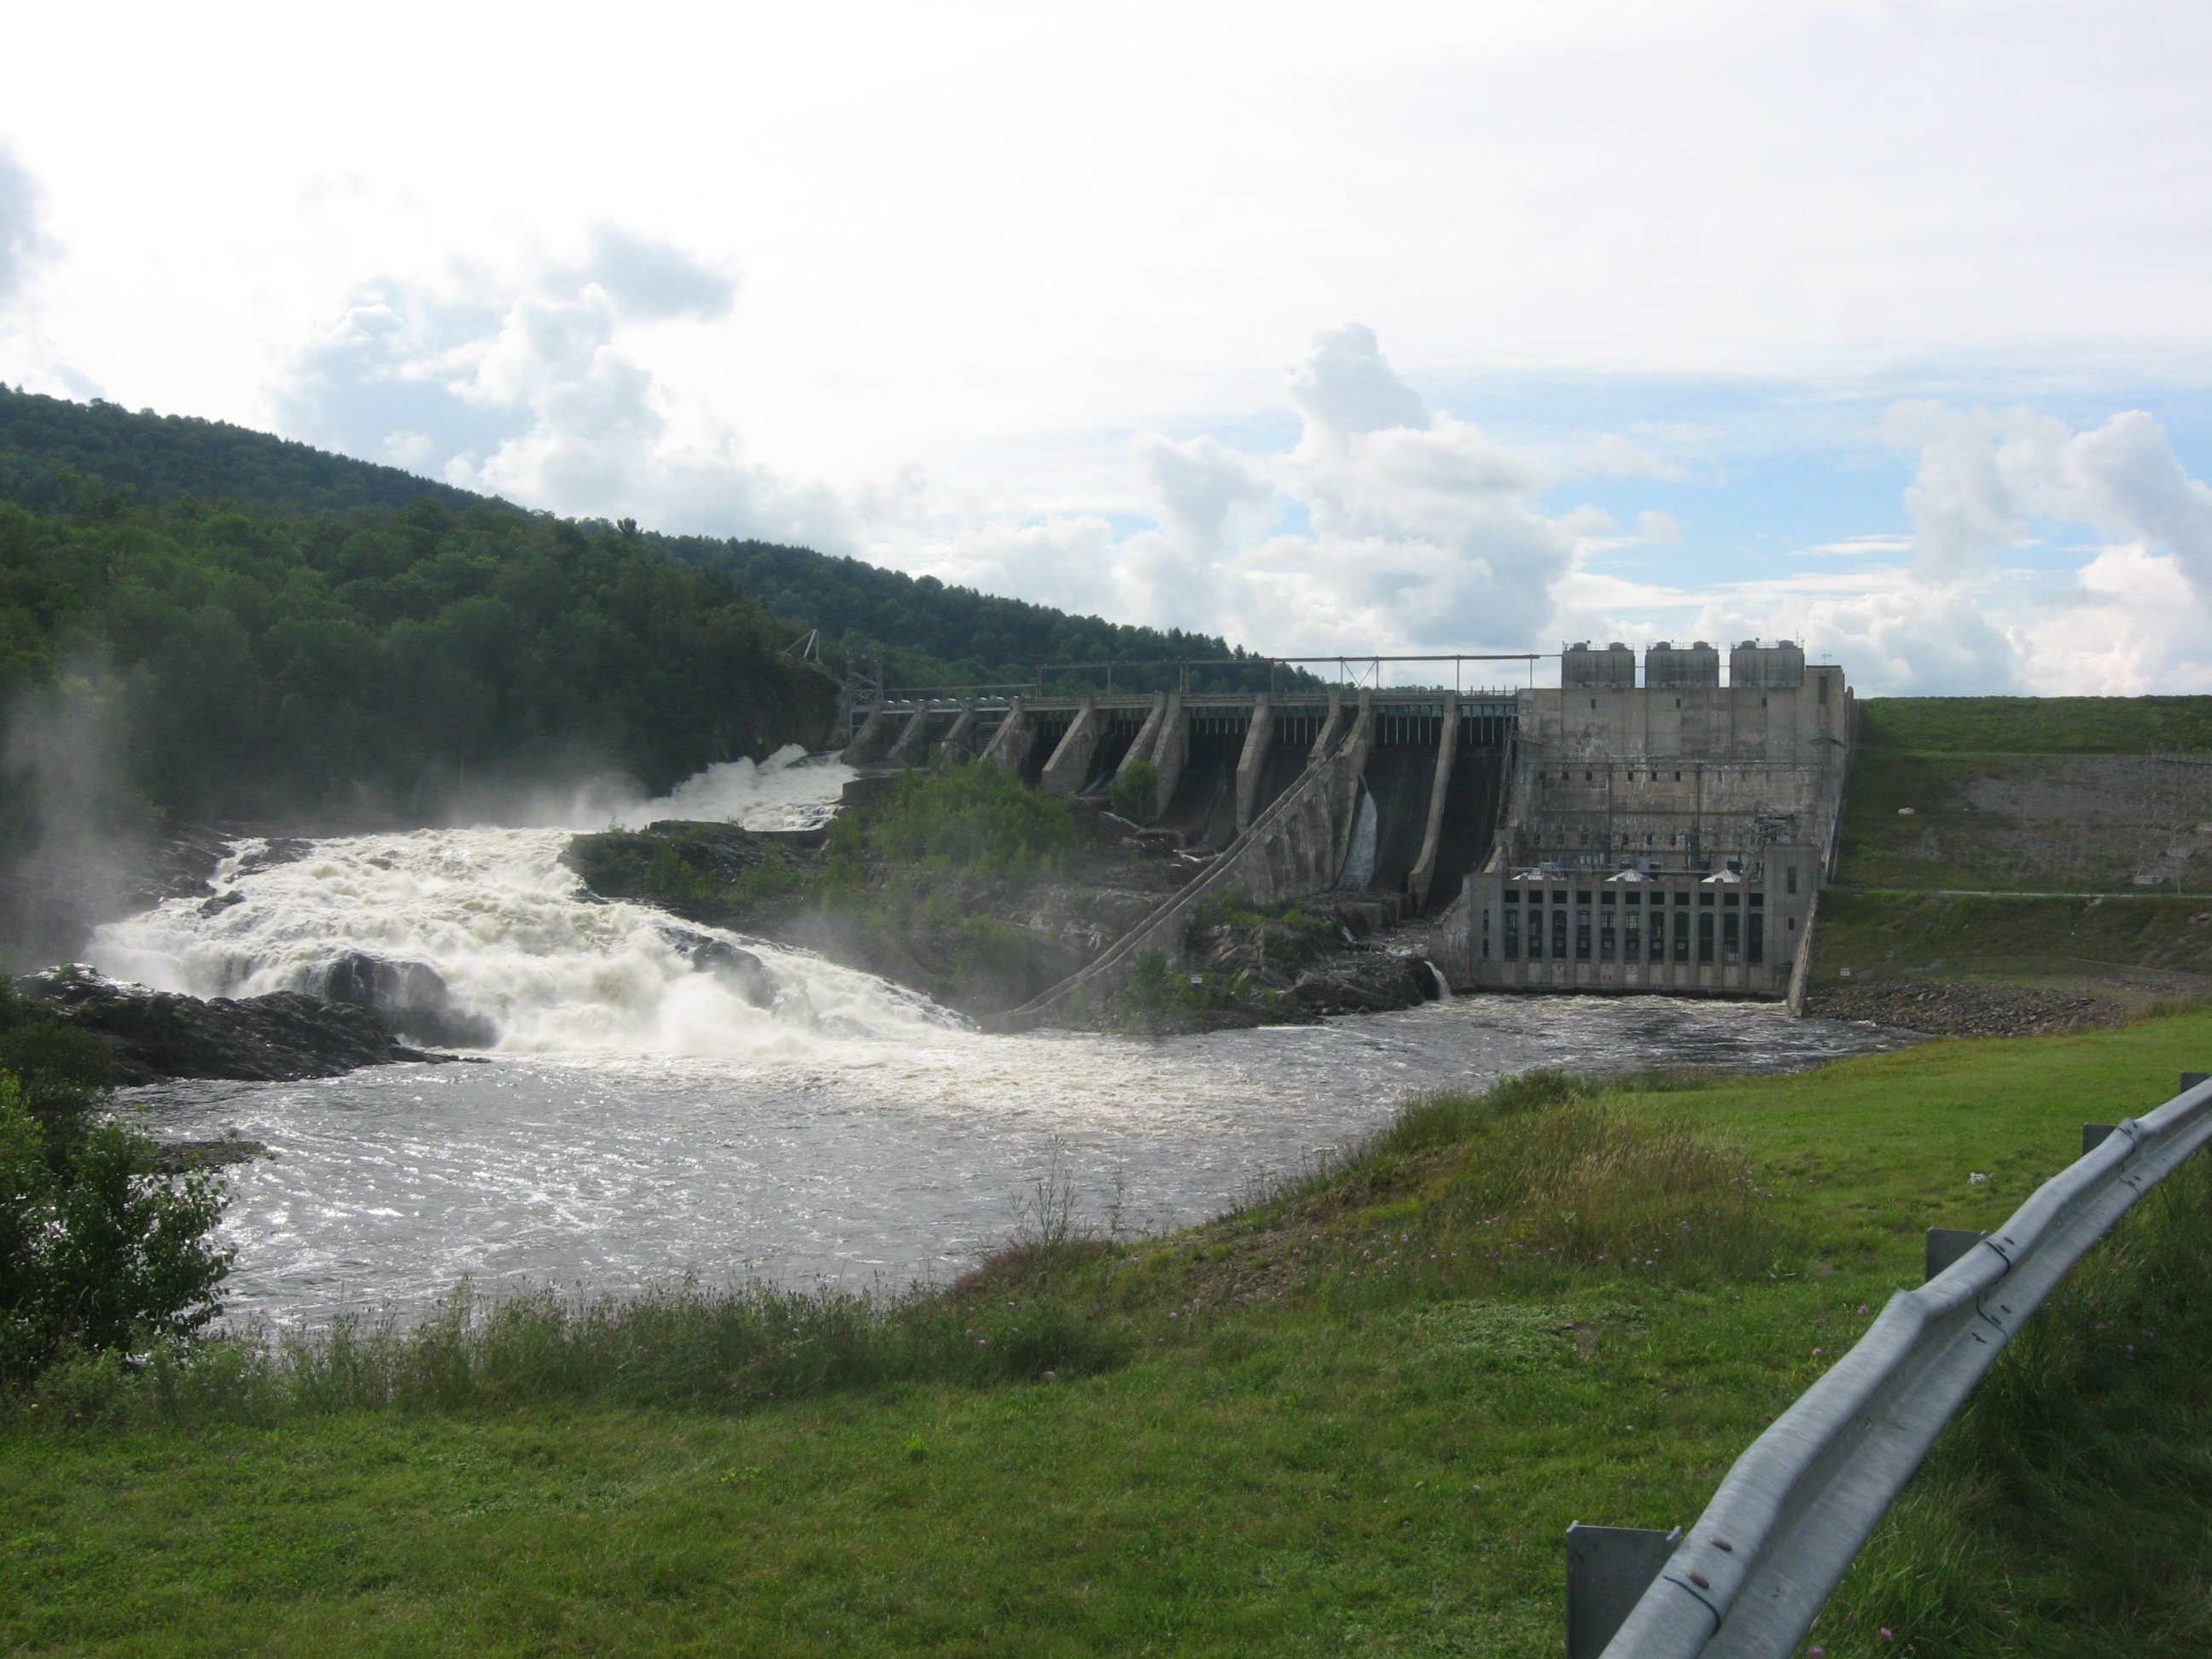 kennebec river at bingham wyman dam maine